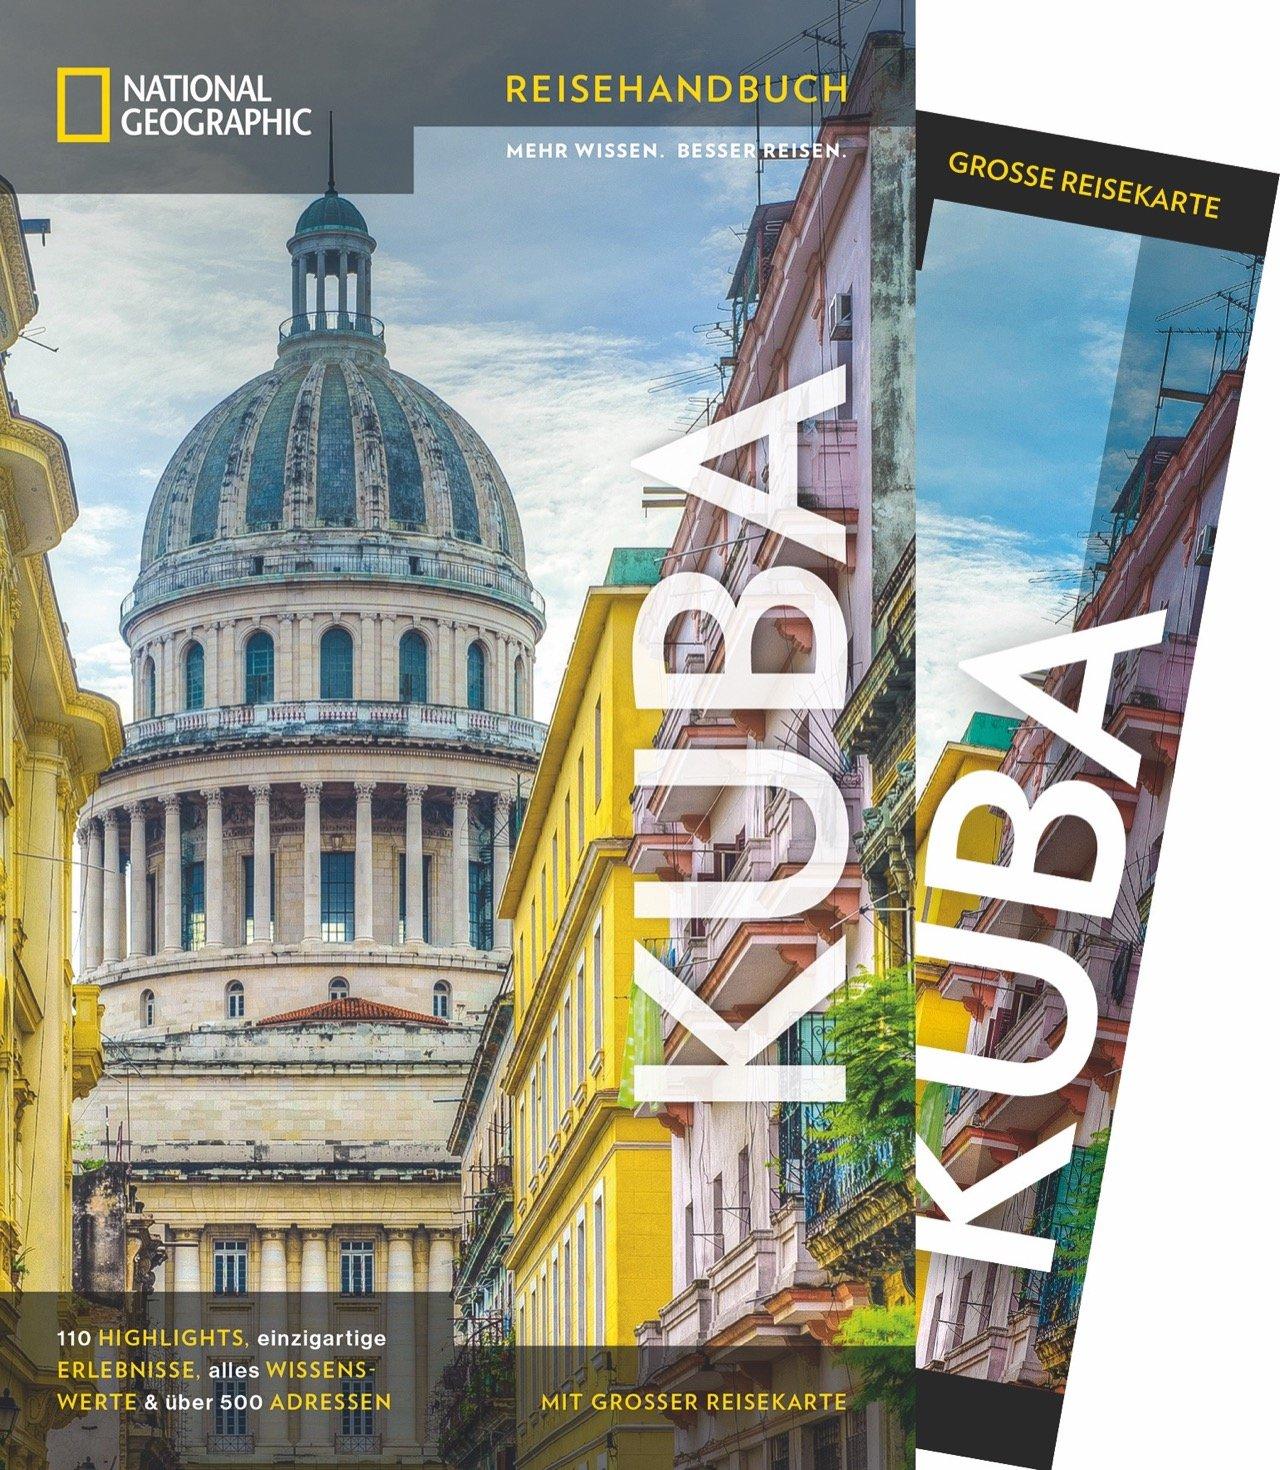 Karte Kuba Varadero.National Geographic Reiseführer Kuba Mit Karte Geheimtipps Und